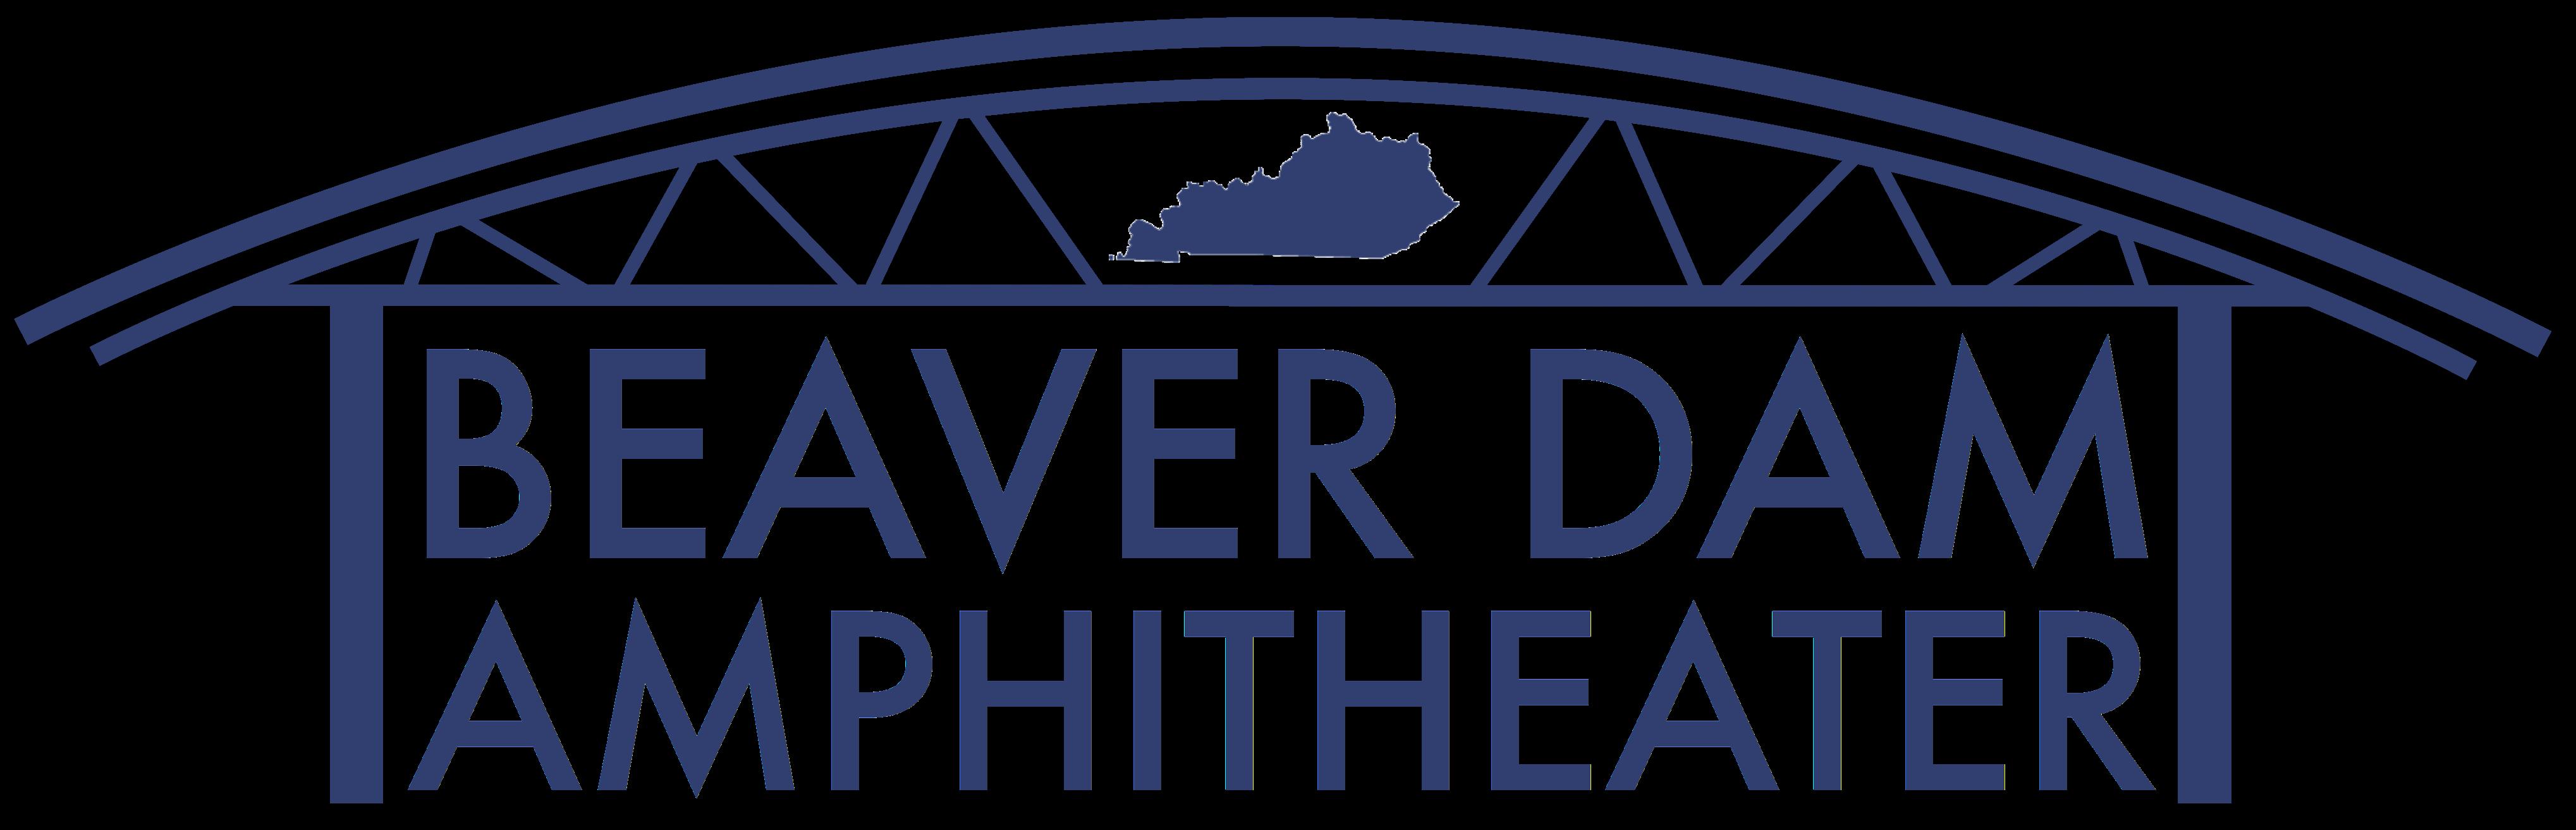 Beaver Dam Ampitheater